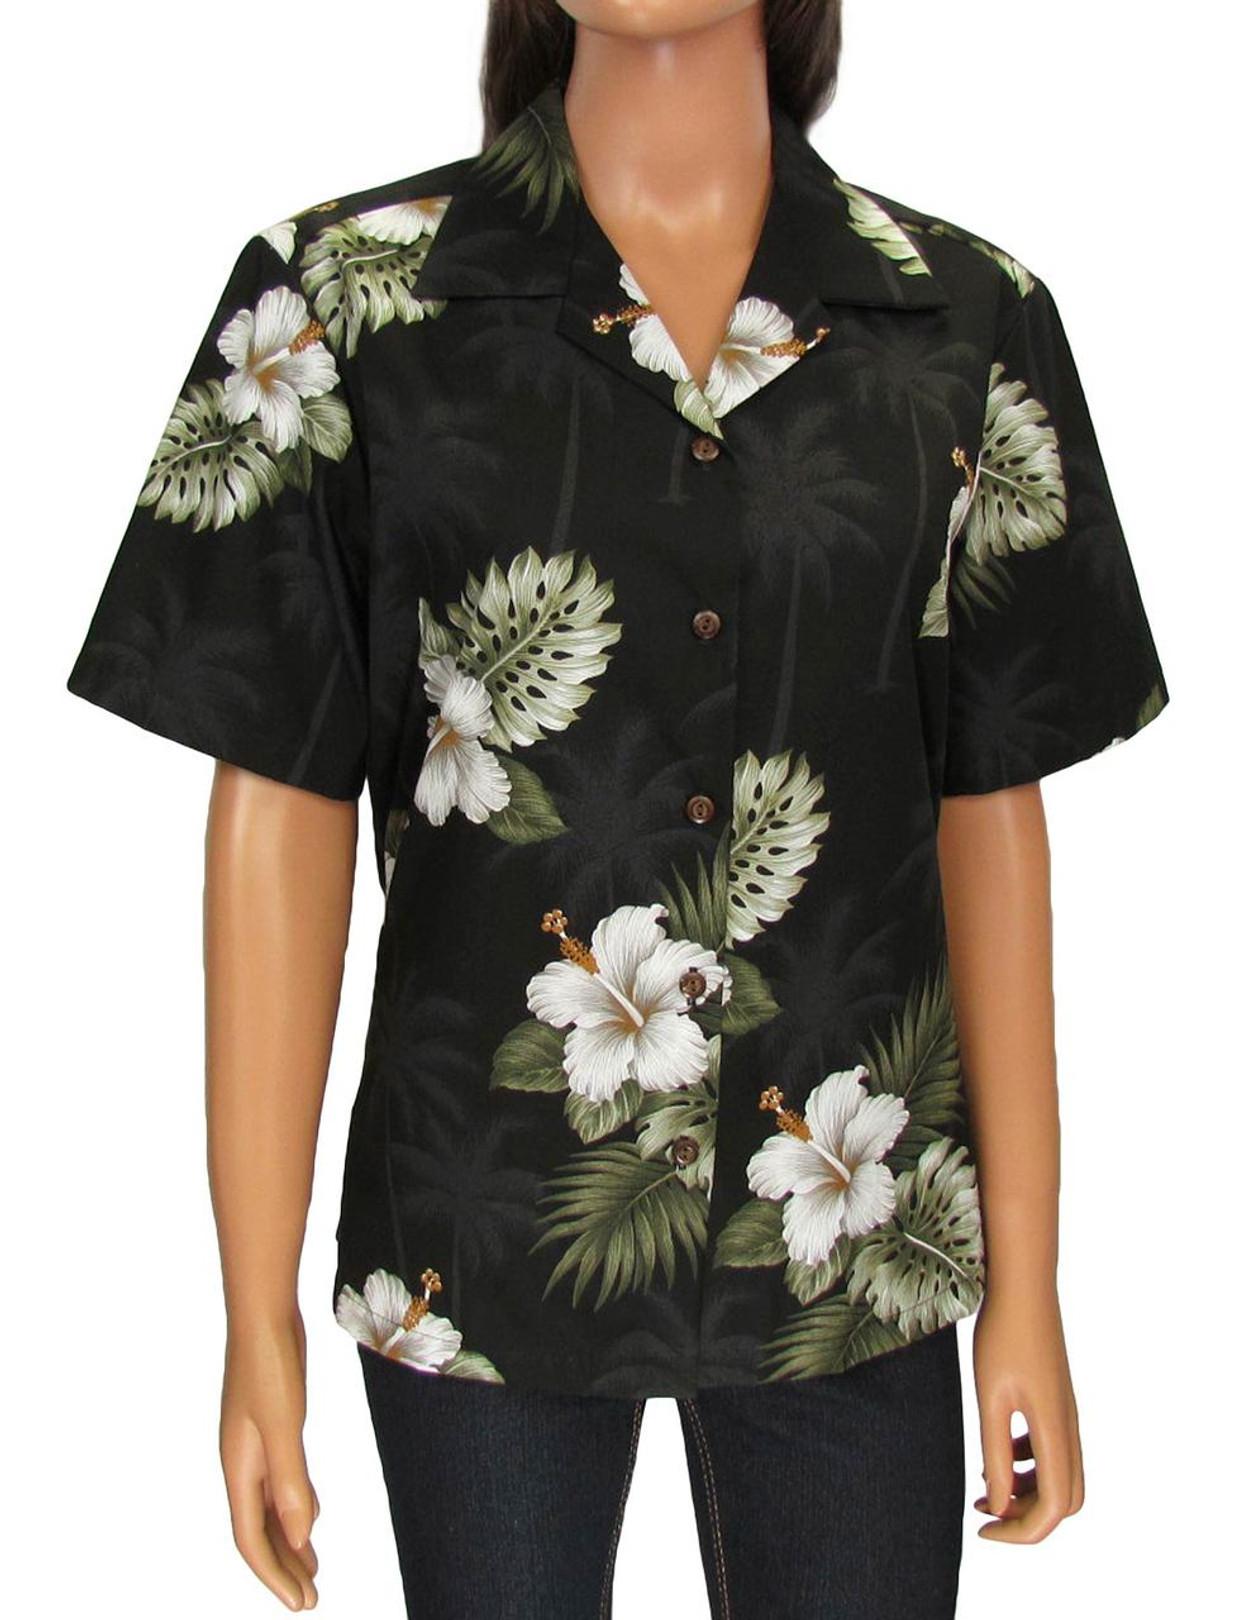 9abc176f52c1c Aloha Camp Blouse - Ka Pua 100% Cotton Loose Design Coconut shell buttons  Colors